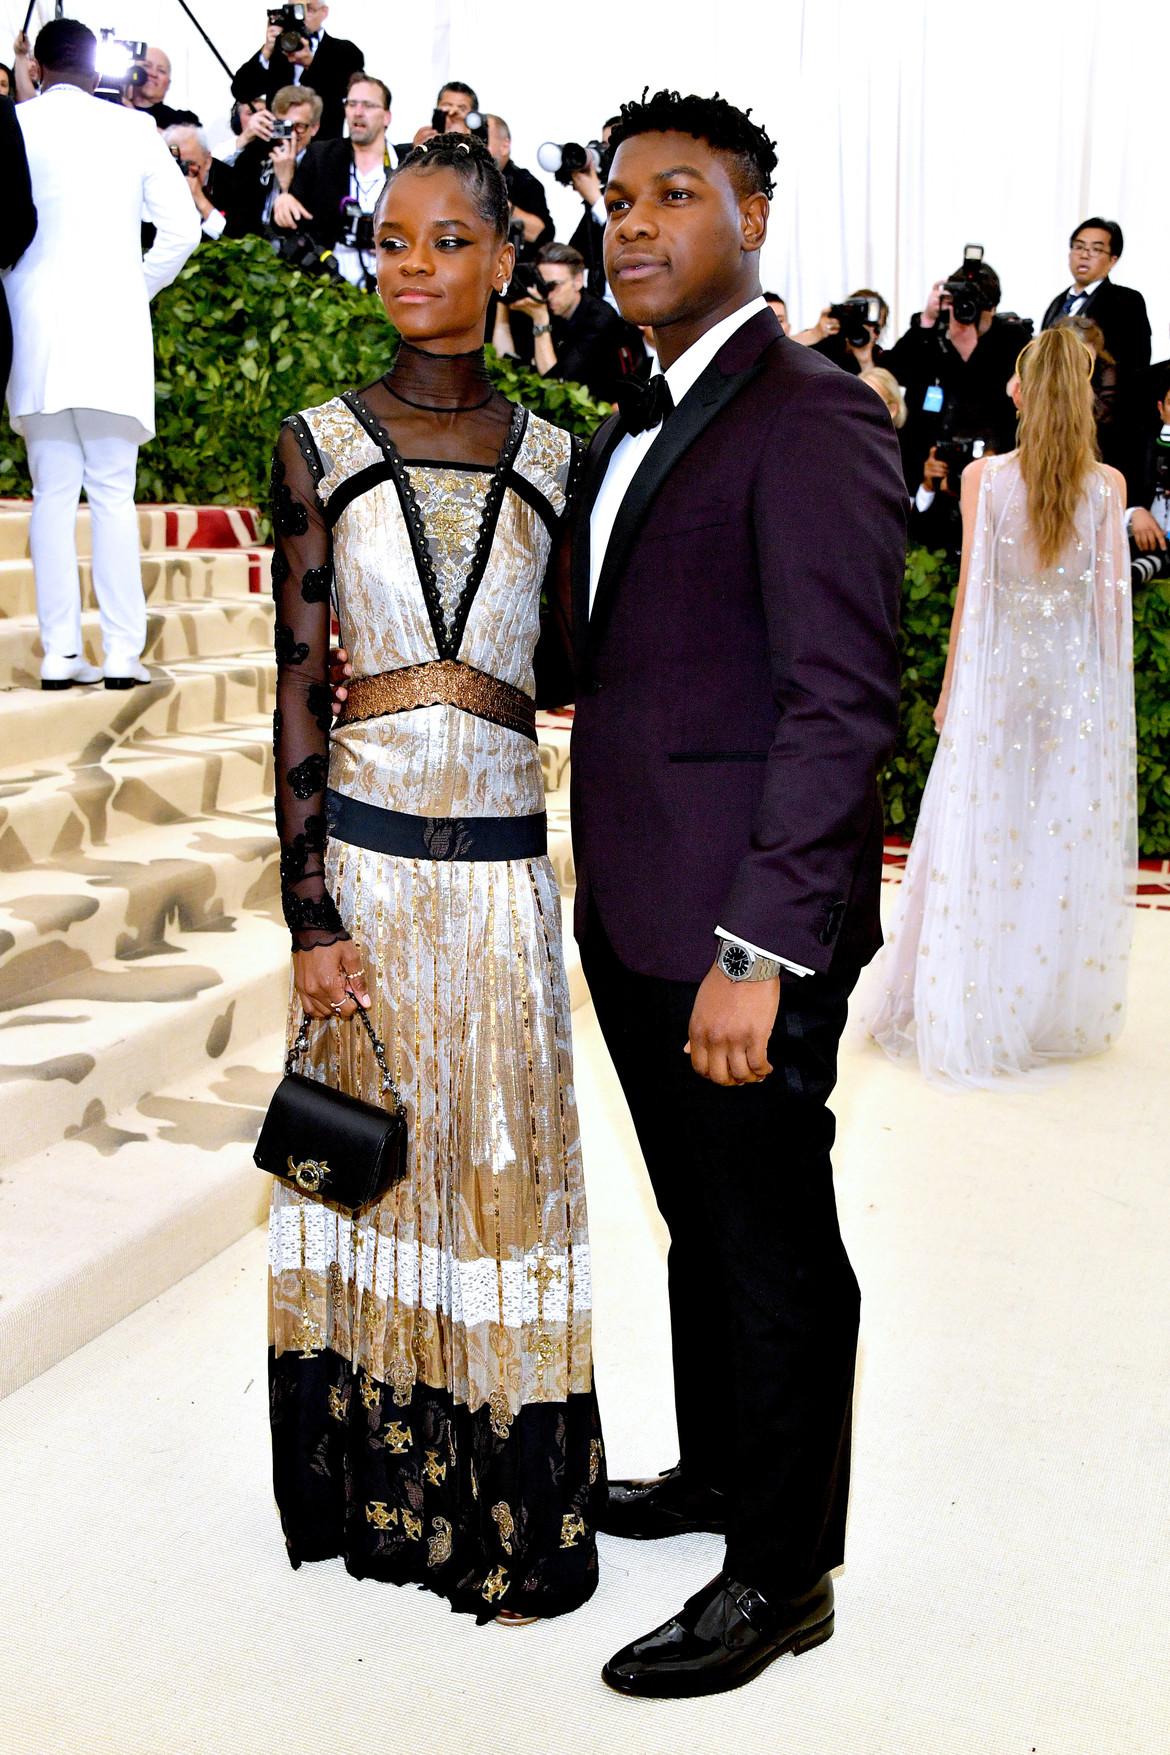 John Boyega and Letitia Wright